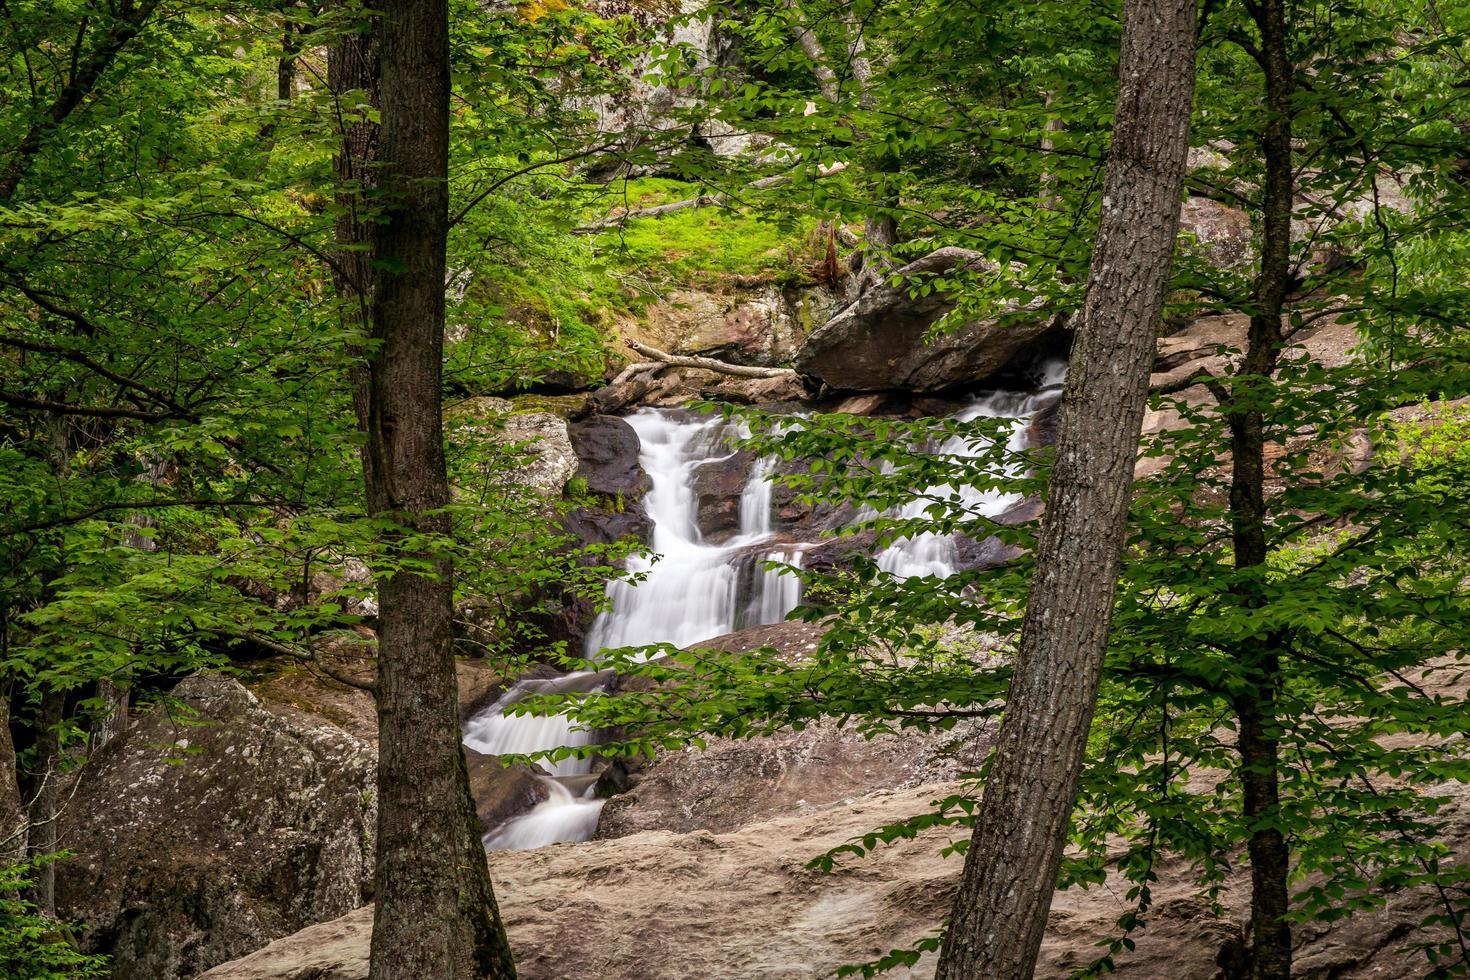 cunningham faller i Maryland foto